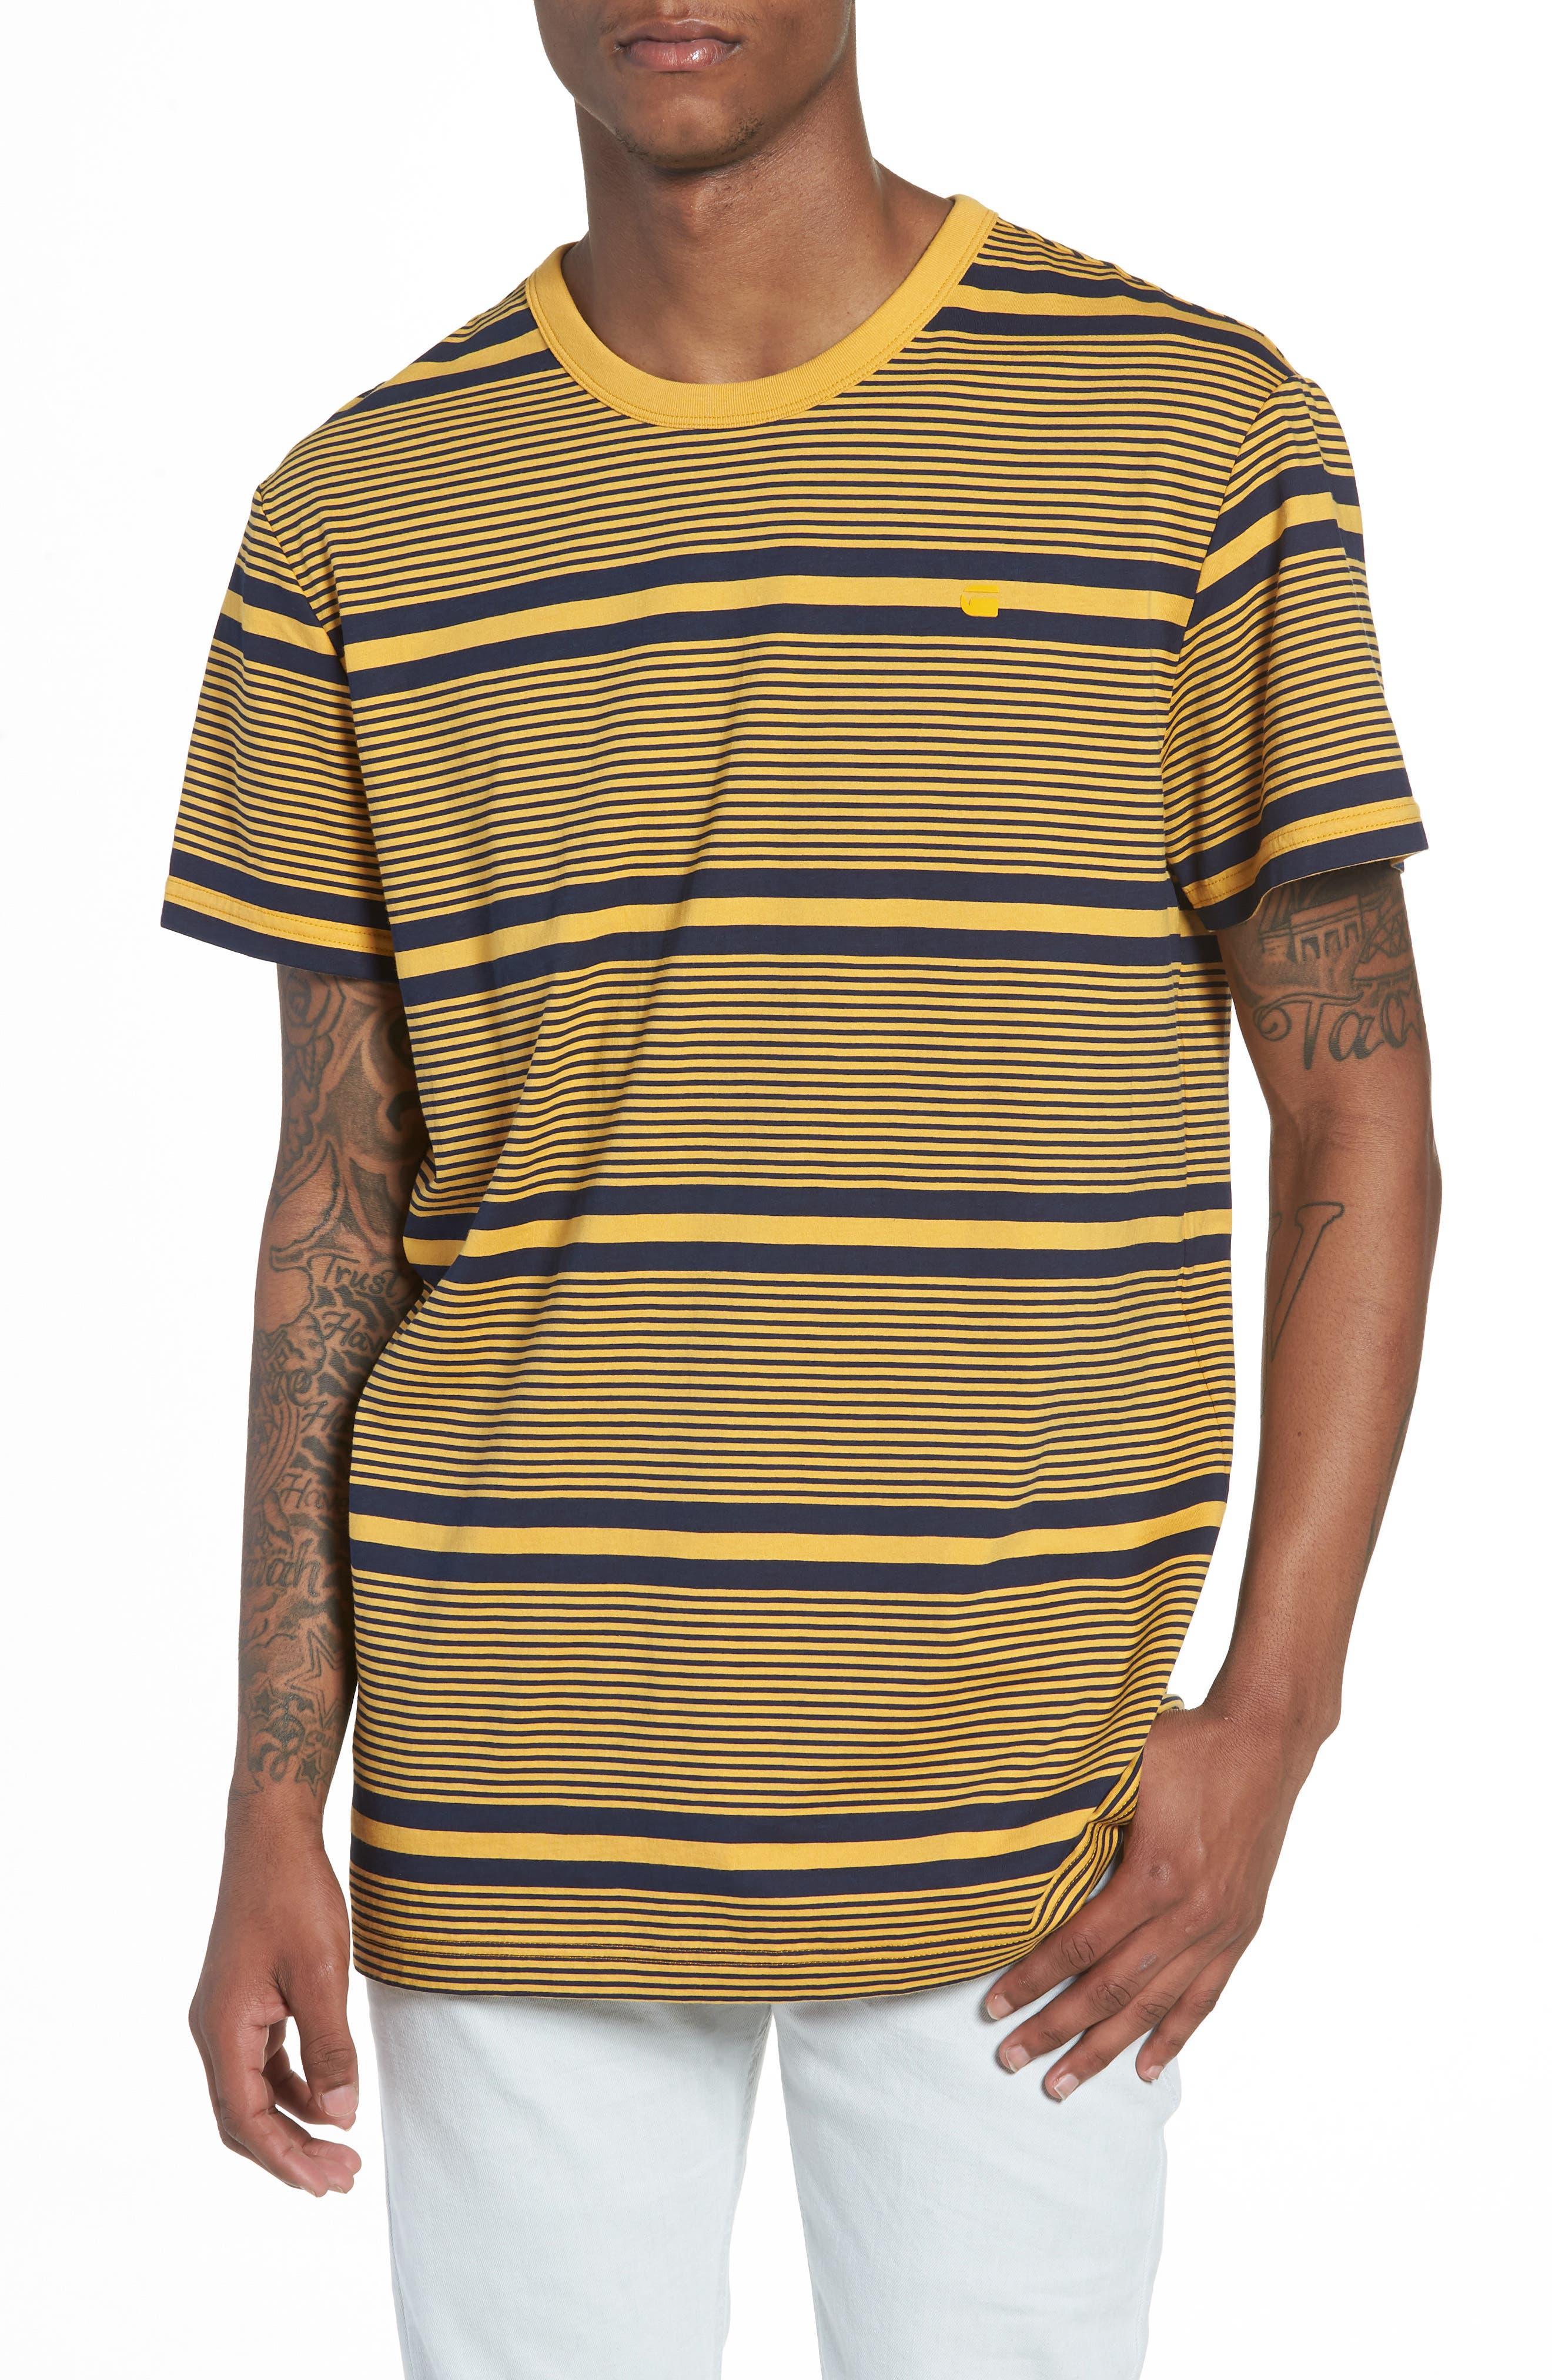 G-Star Raw Makauri Stripe 5 T-Shirt